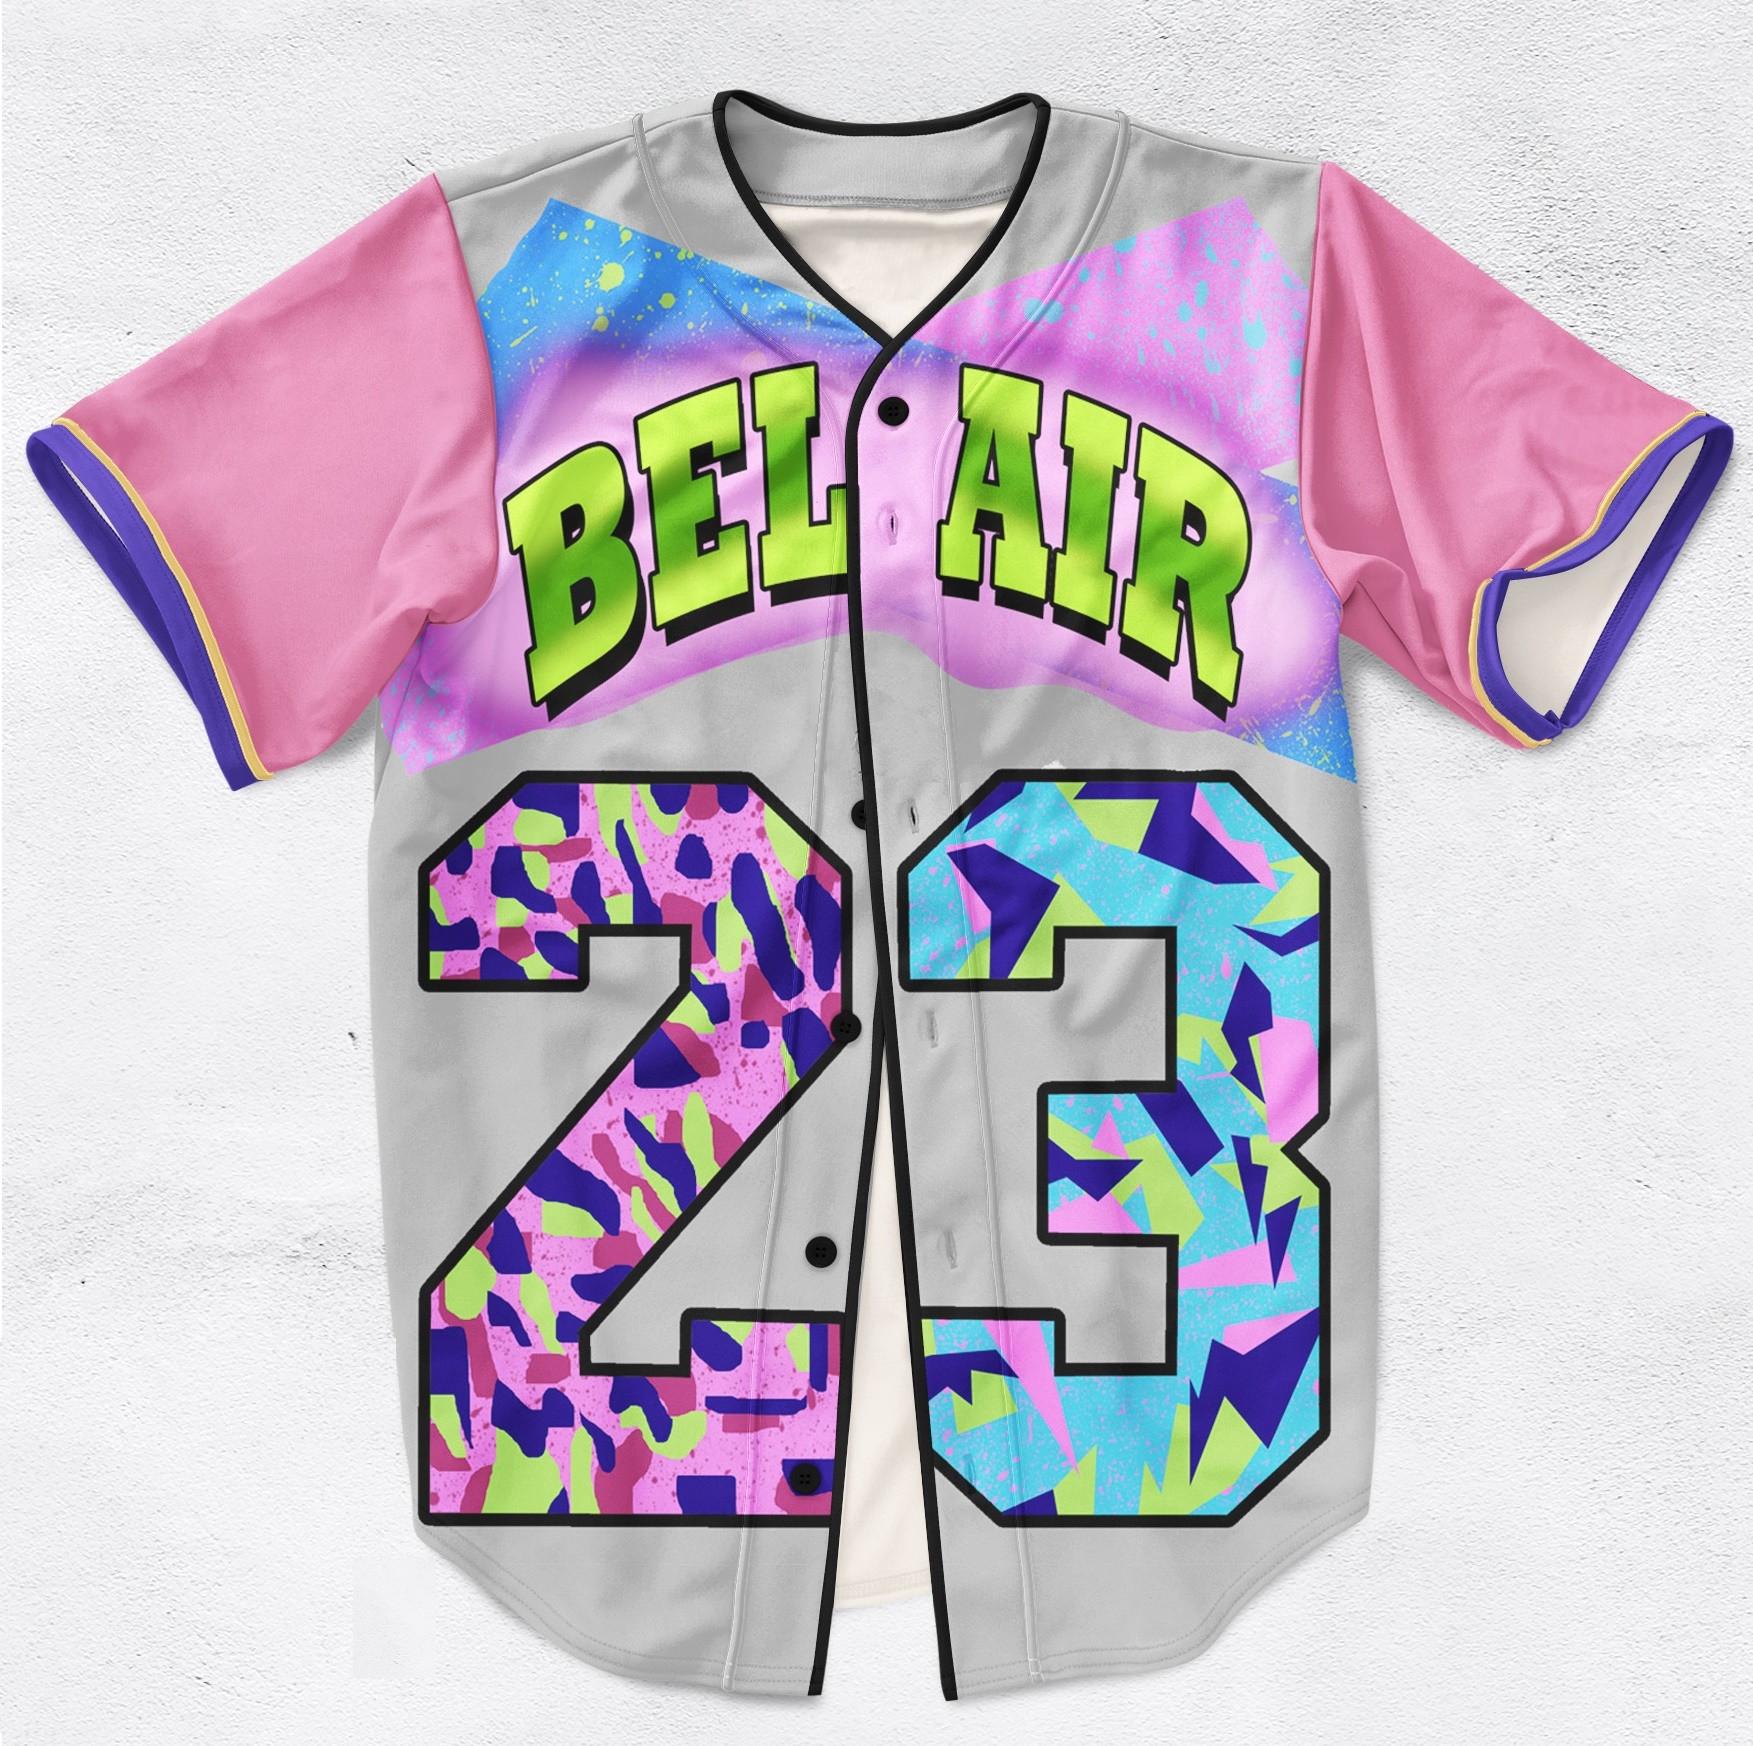 b460952c48d7 Belair 23 Fresh Prince Baseball Jersey on Storenvy